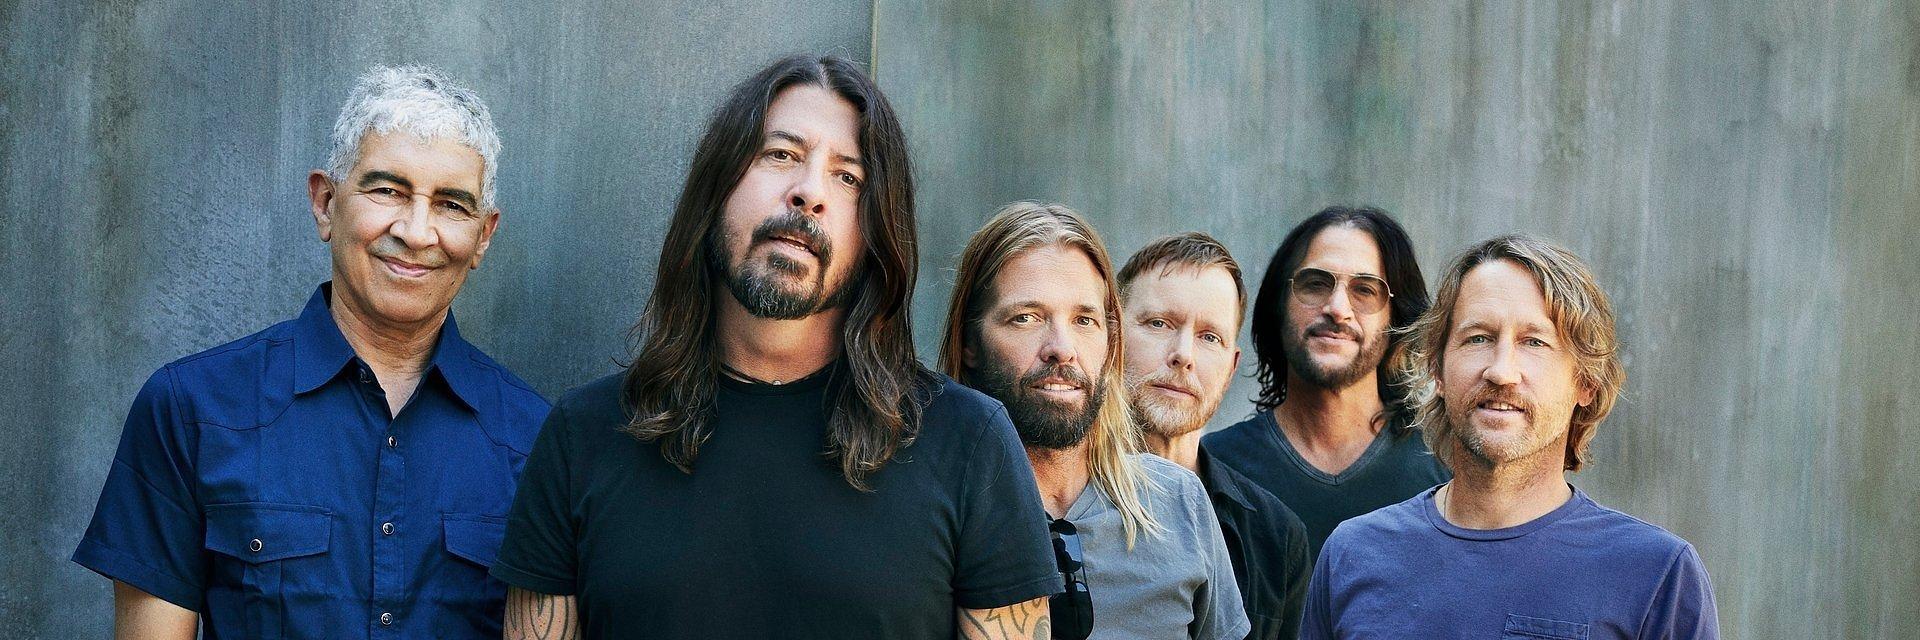 Film autorstwa Foo Fighters już od 30 kwietnia w Amazon Prime!